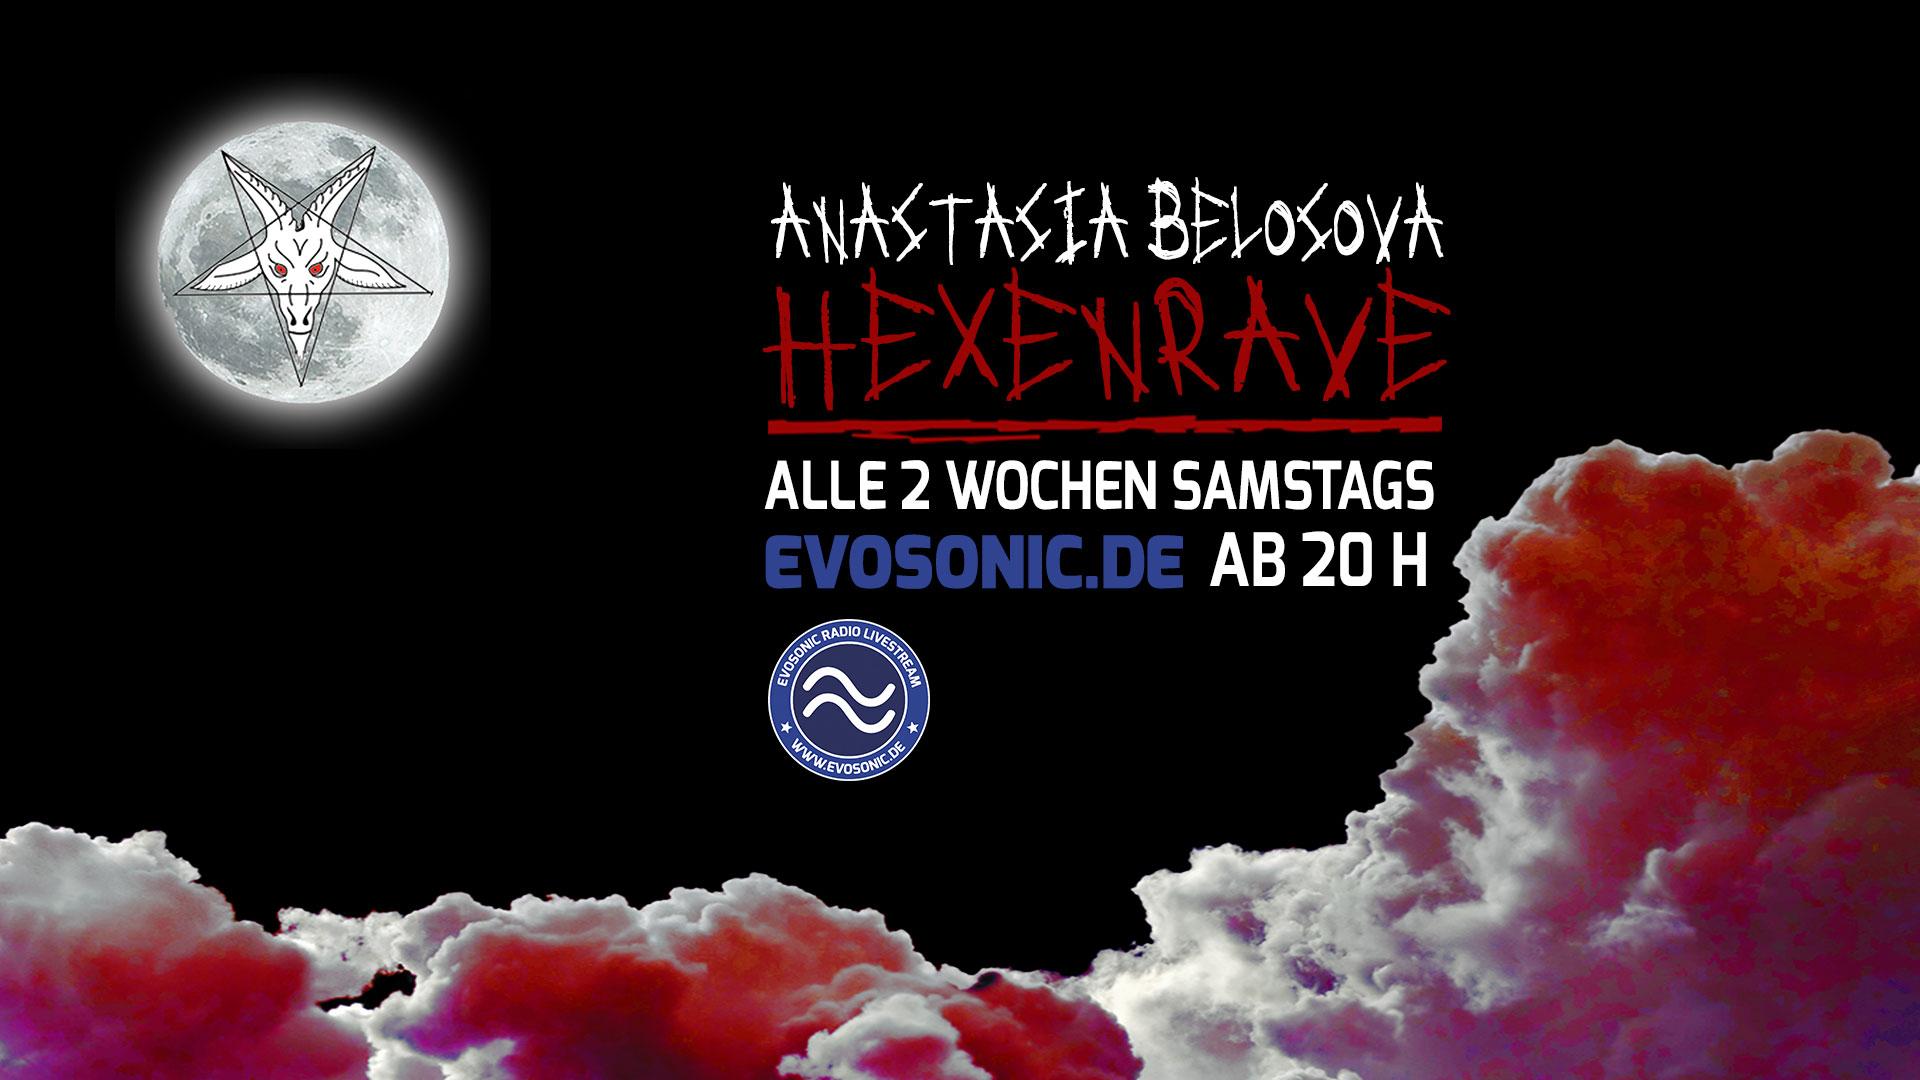 HEXENRAVE mit ANASTASIA BELOSOVA